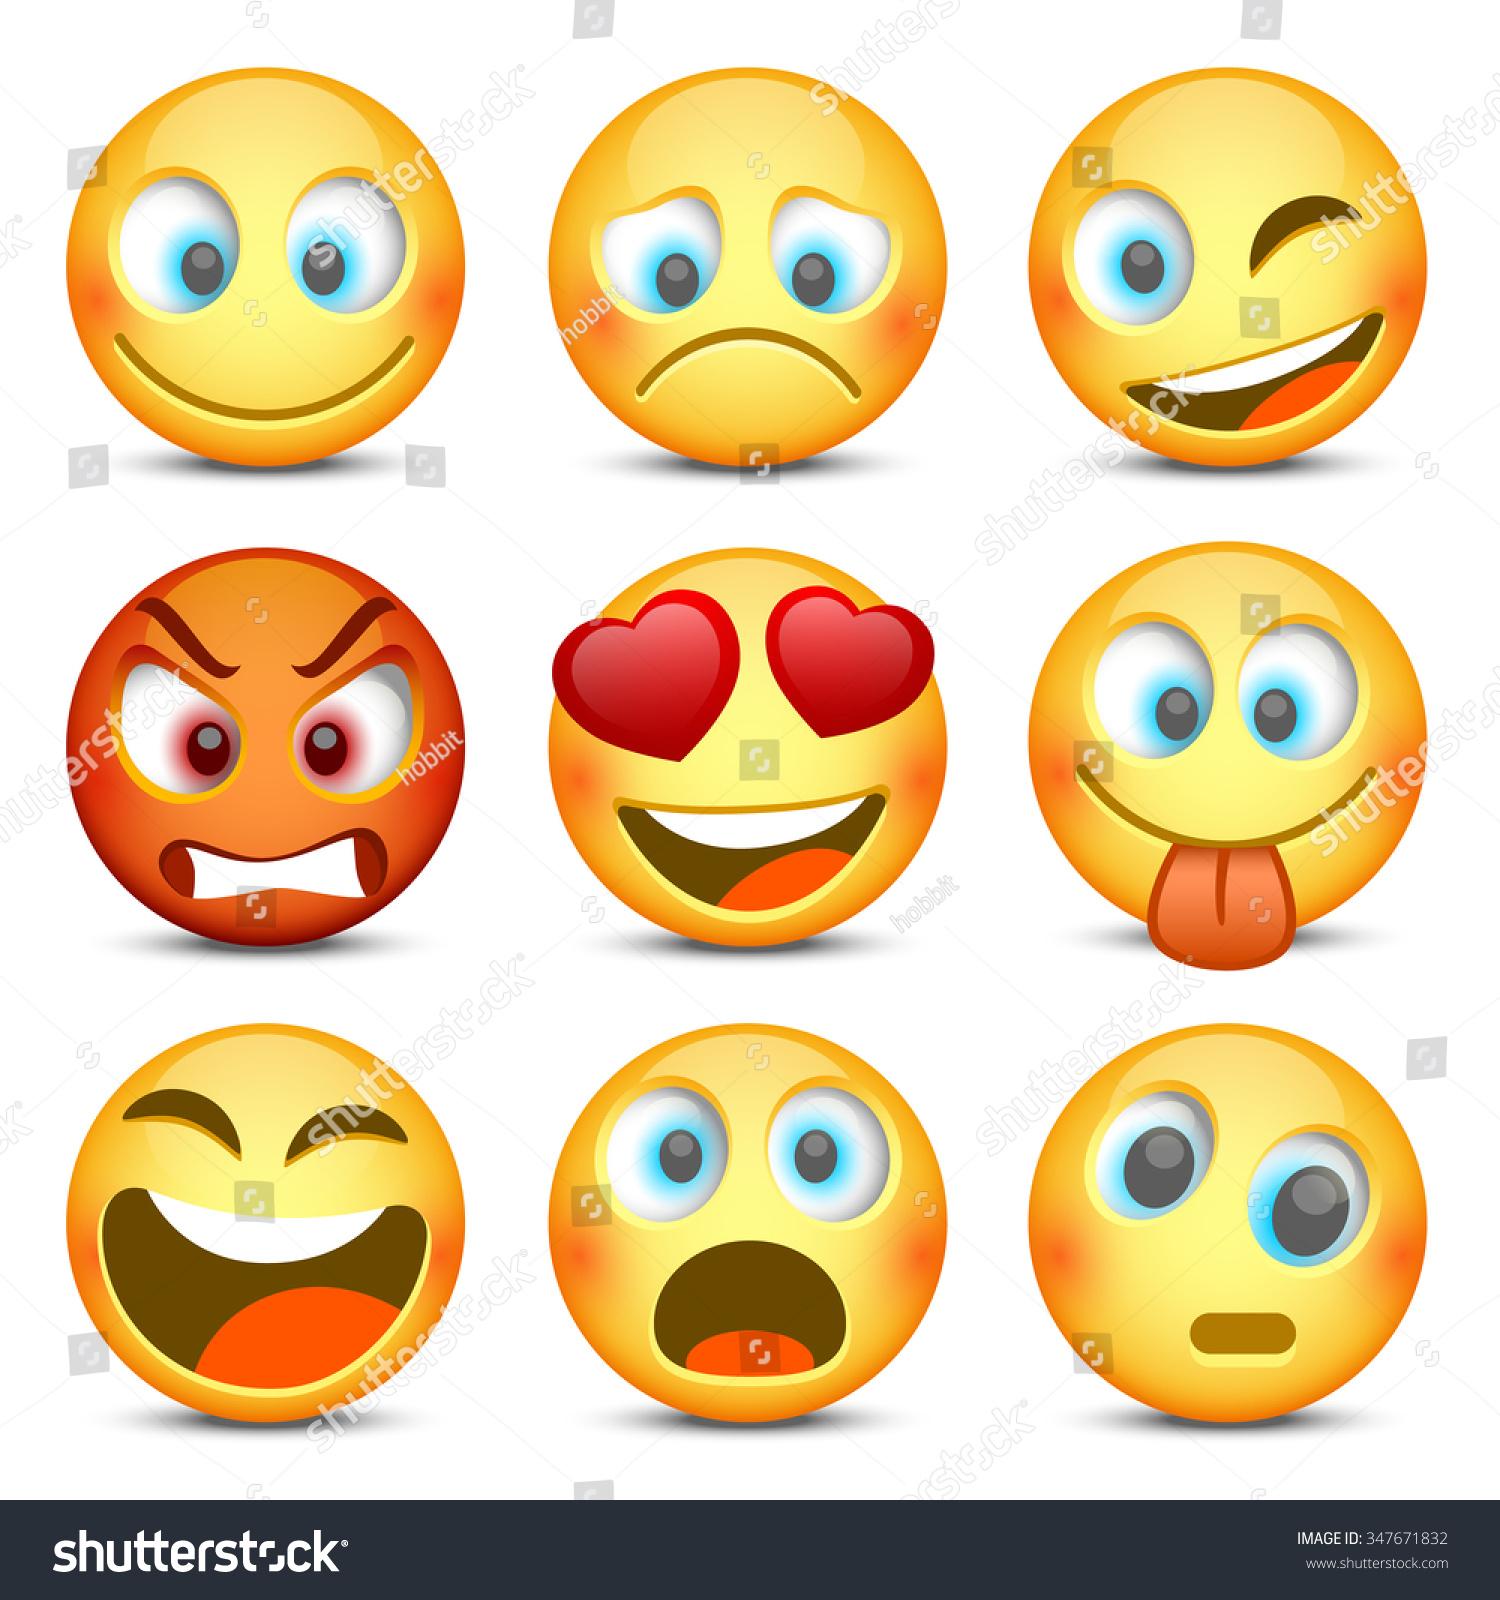 Emoji And Sad Icon Set. Vector Illustration - 347671832 ...